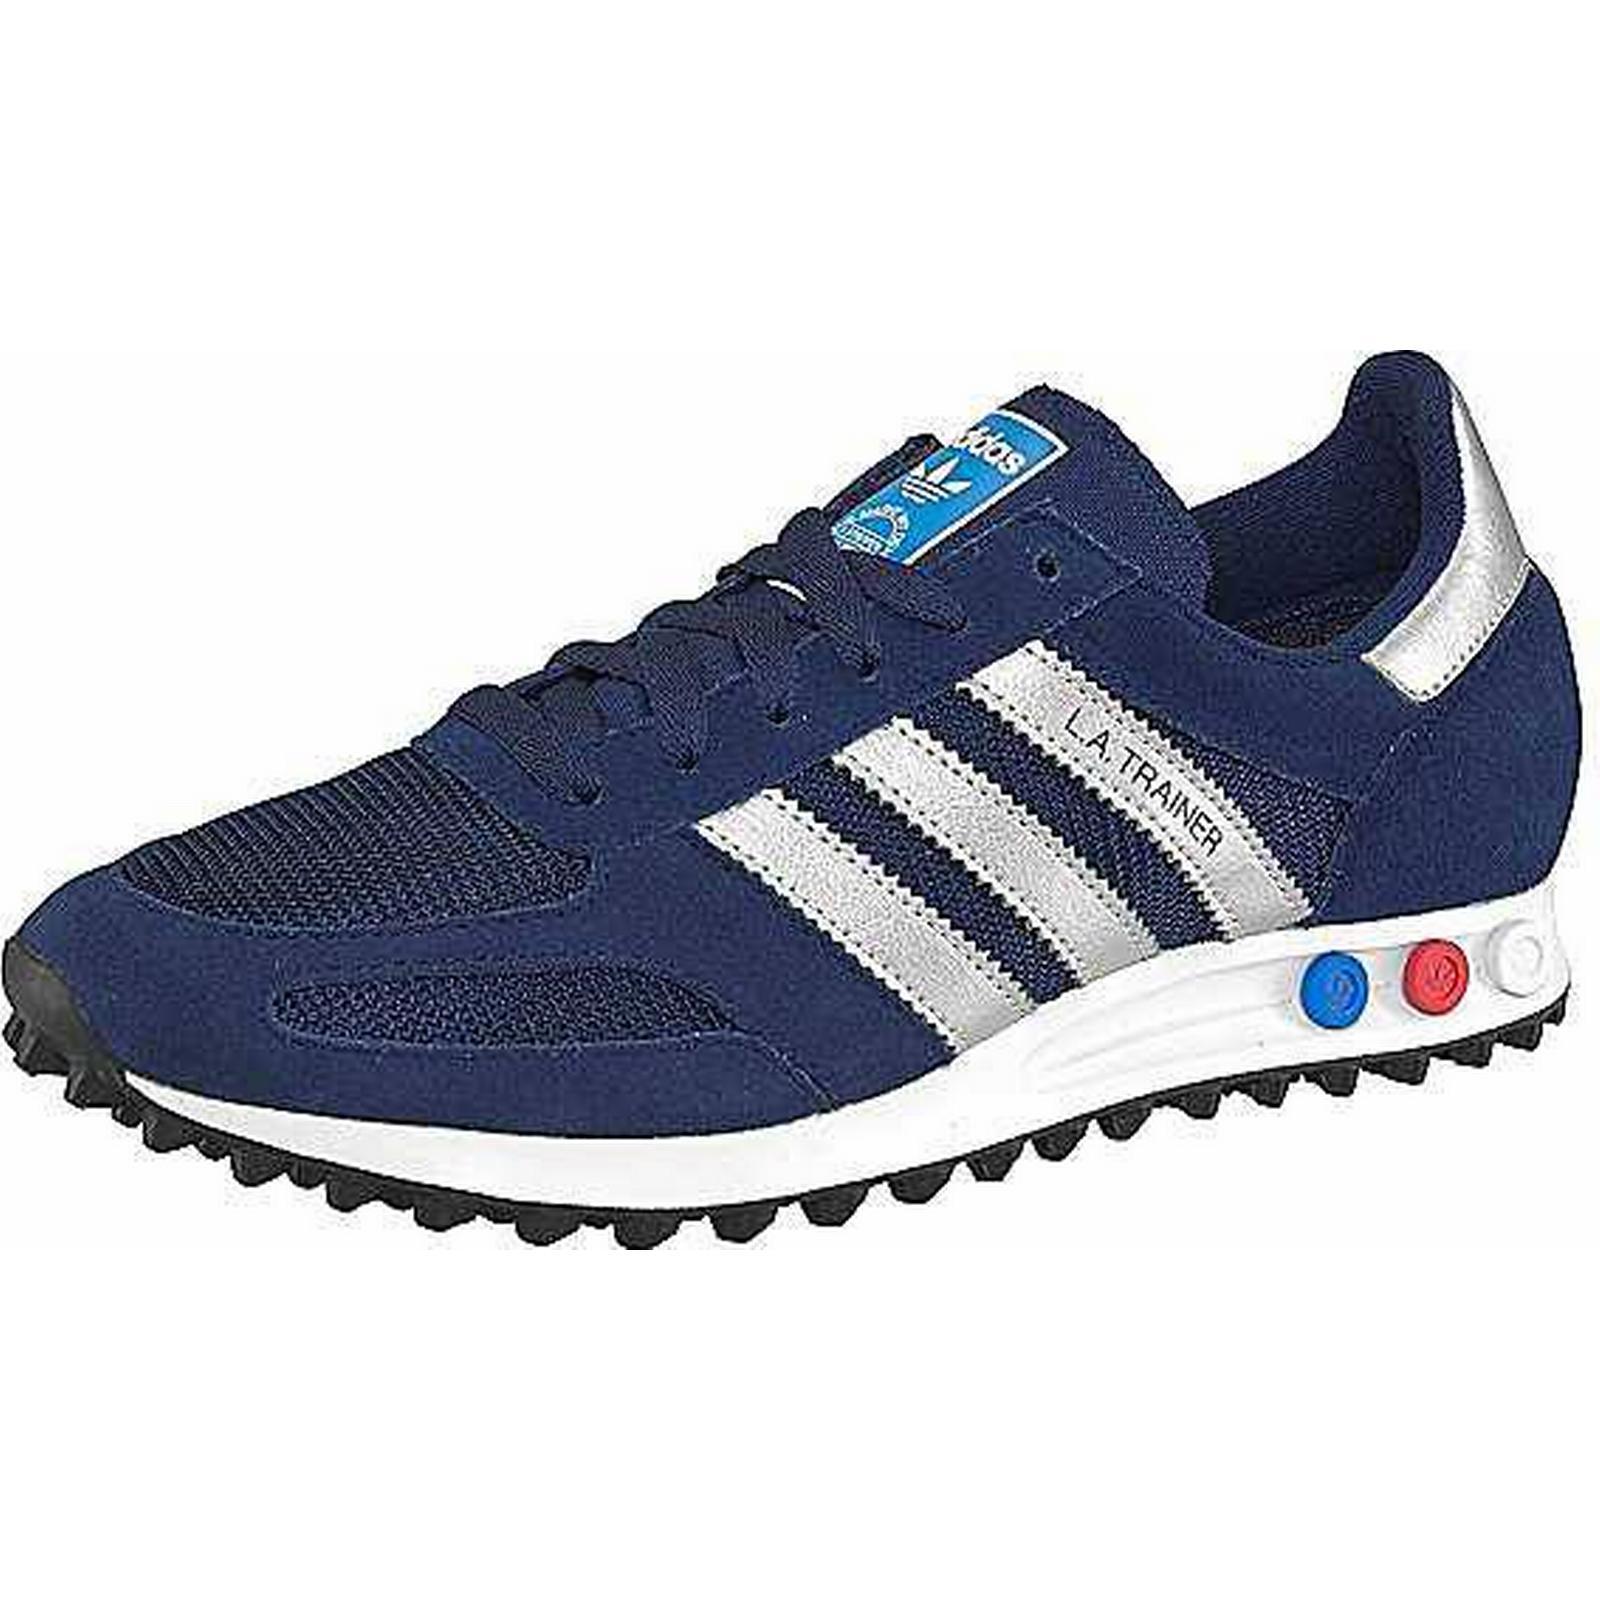 Adidas Originals LA Trainer and OG Trainers by adidas Originals/Gentlemen/Ladies/temperament and Trainer ambiguity, 9d8c69